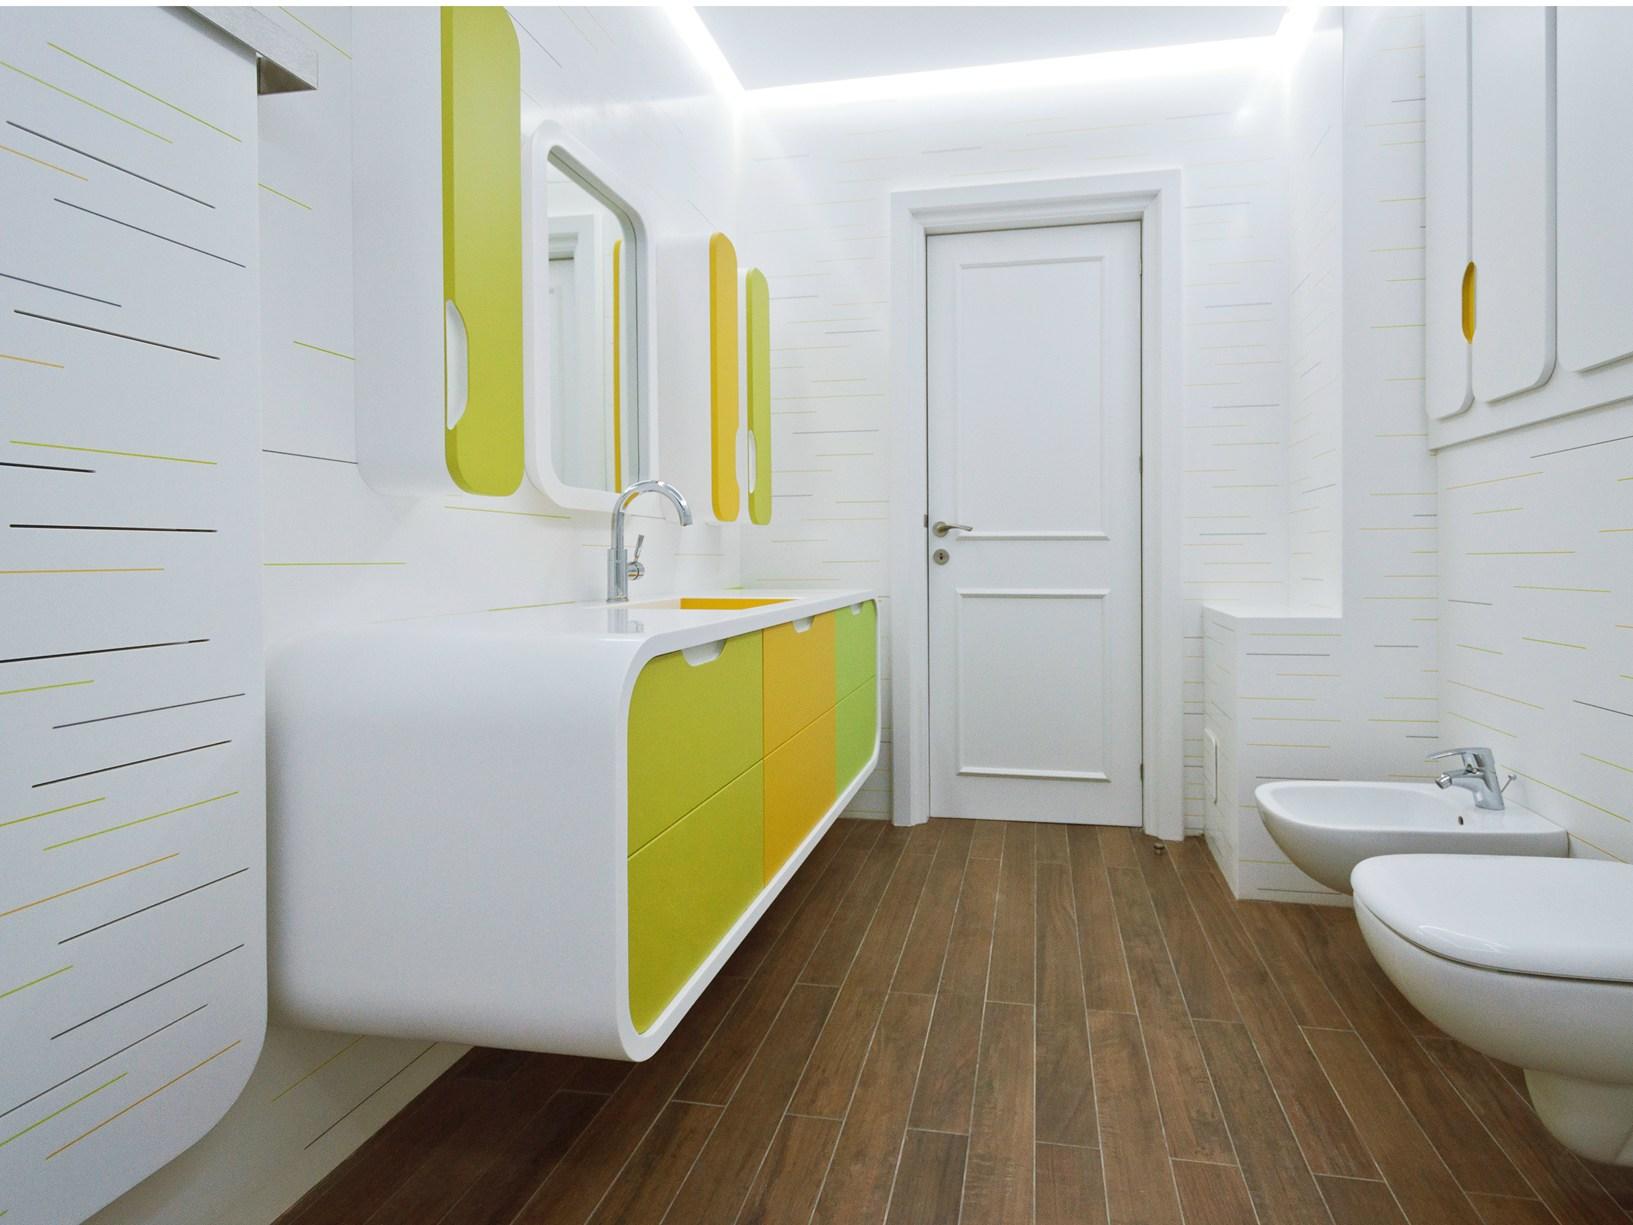 salle de bain vert pistache. Black Bedroom Furniture Sets. Home Design Ideas